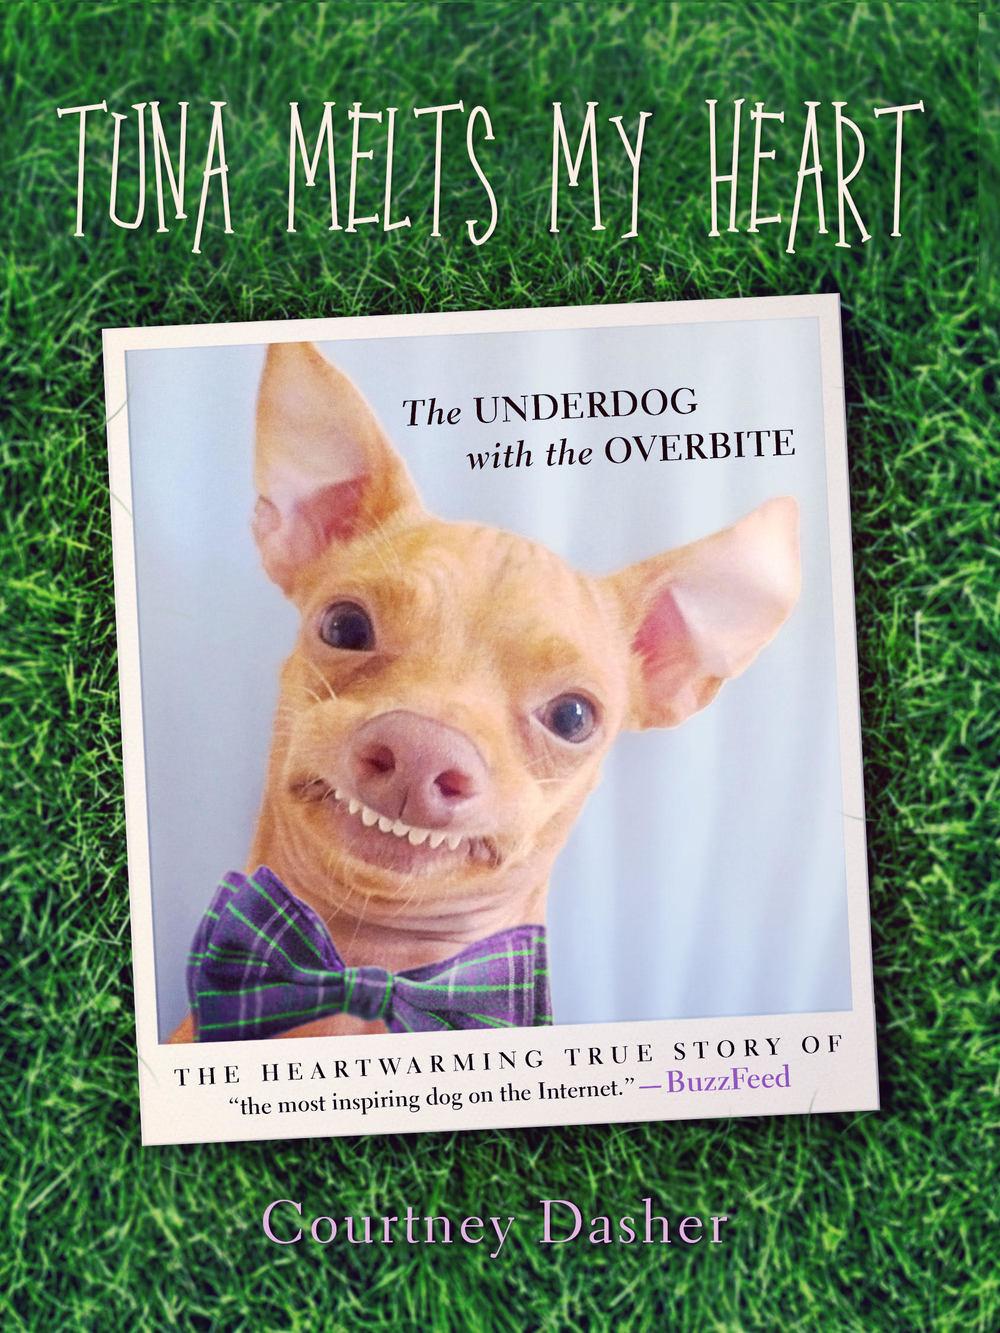 THE TUNA BOOK